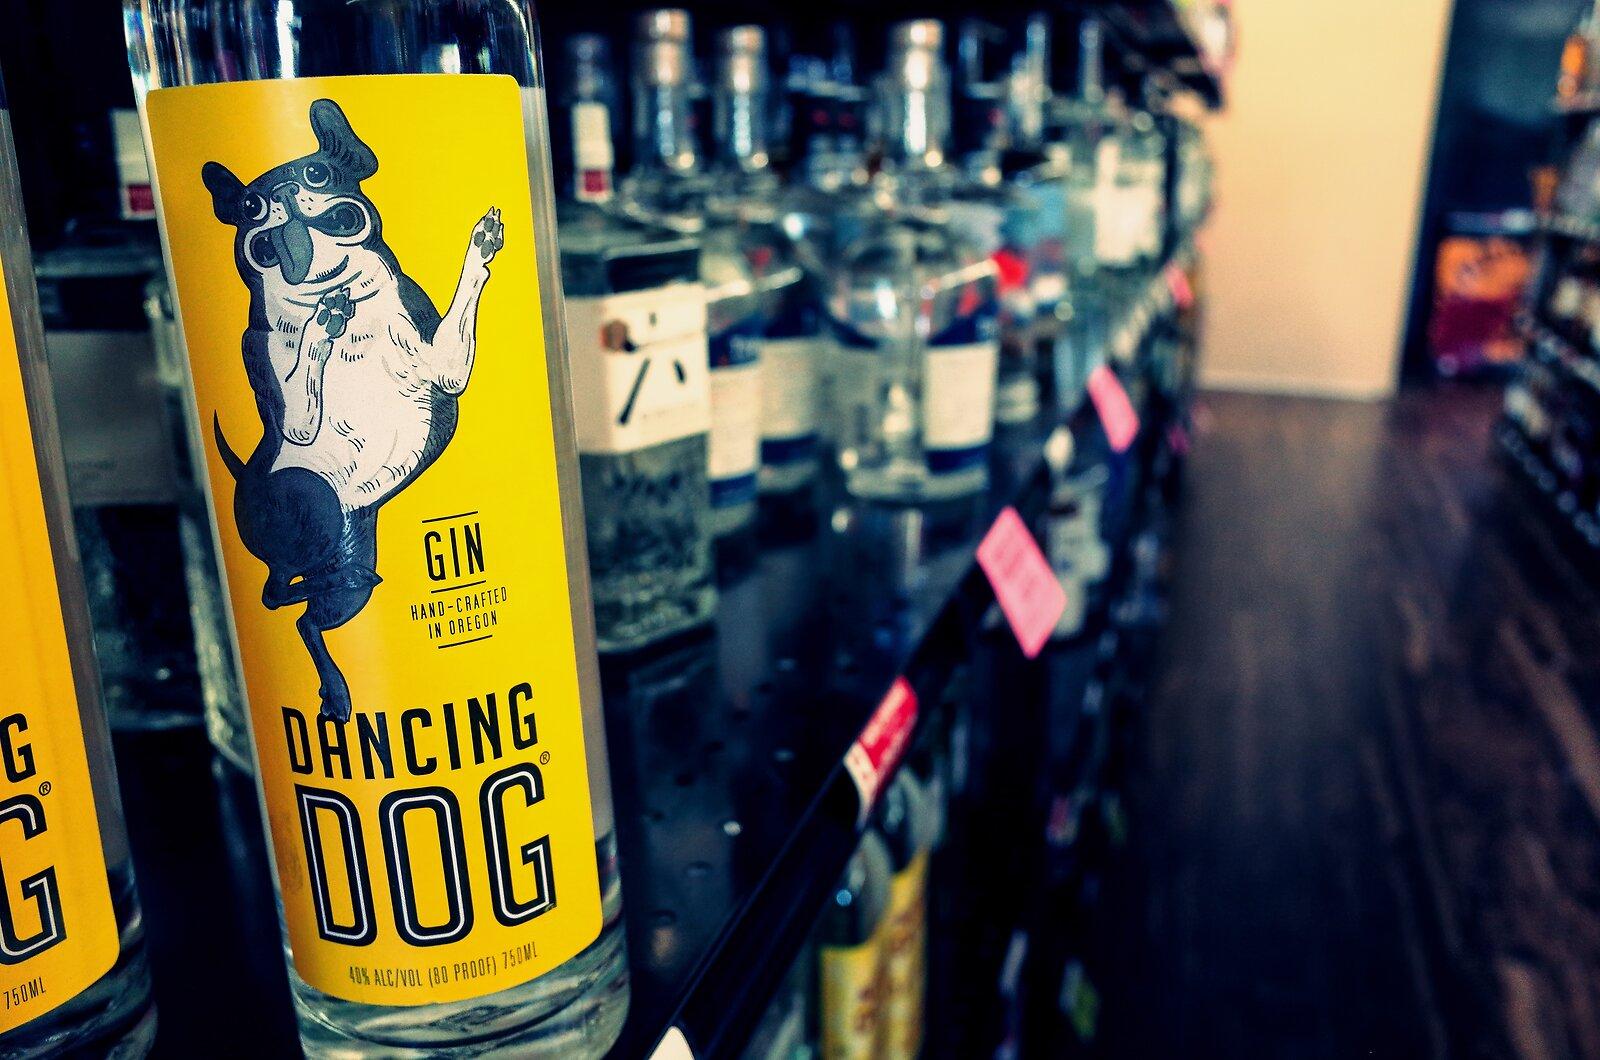 GRII_June10_Dancing_Dog(XP).jpg